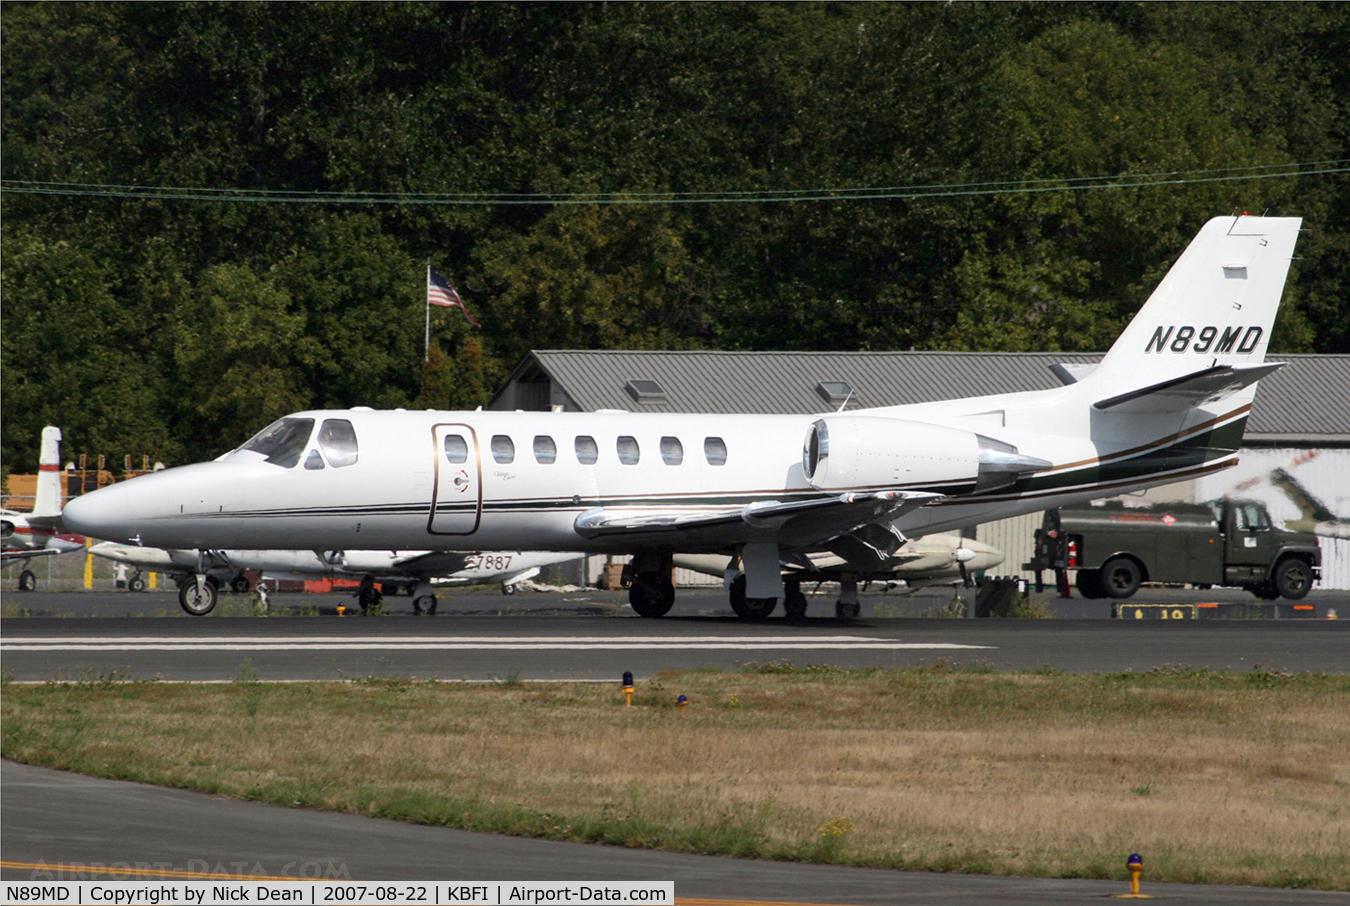 N89MD, 2002 Cessna 560 C/N 560-0612, KBFI